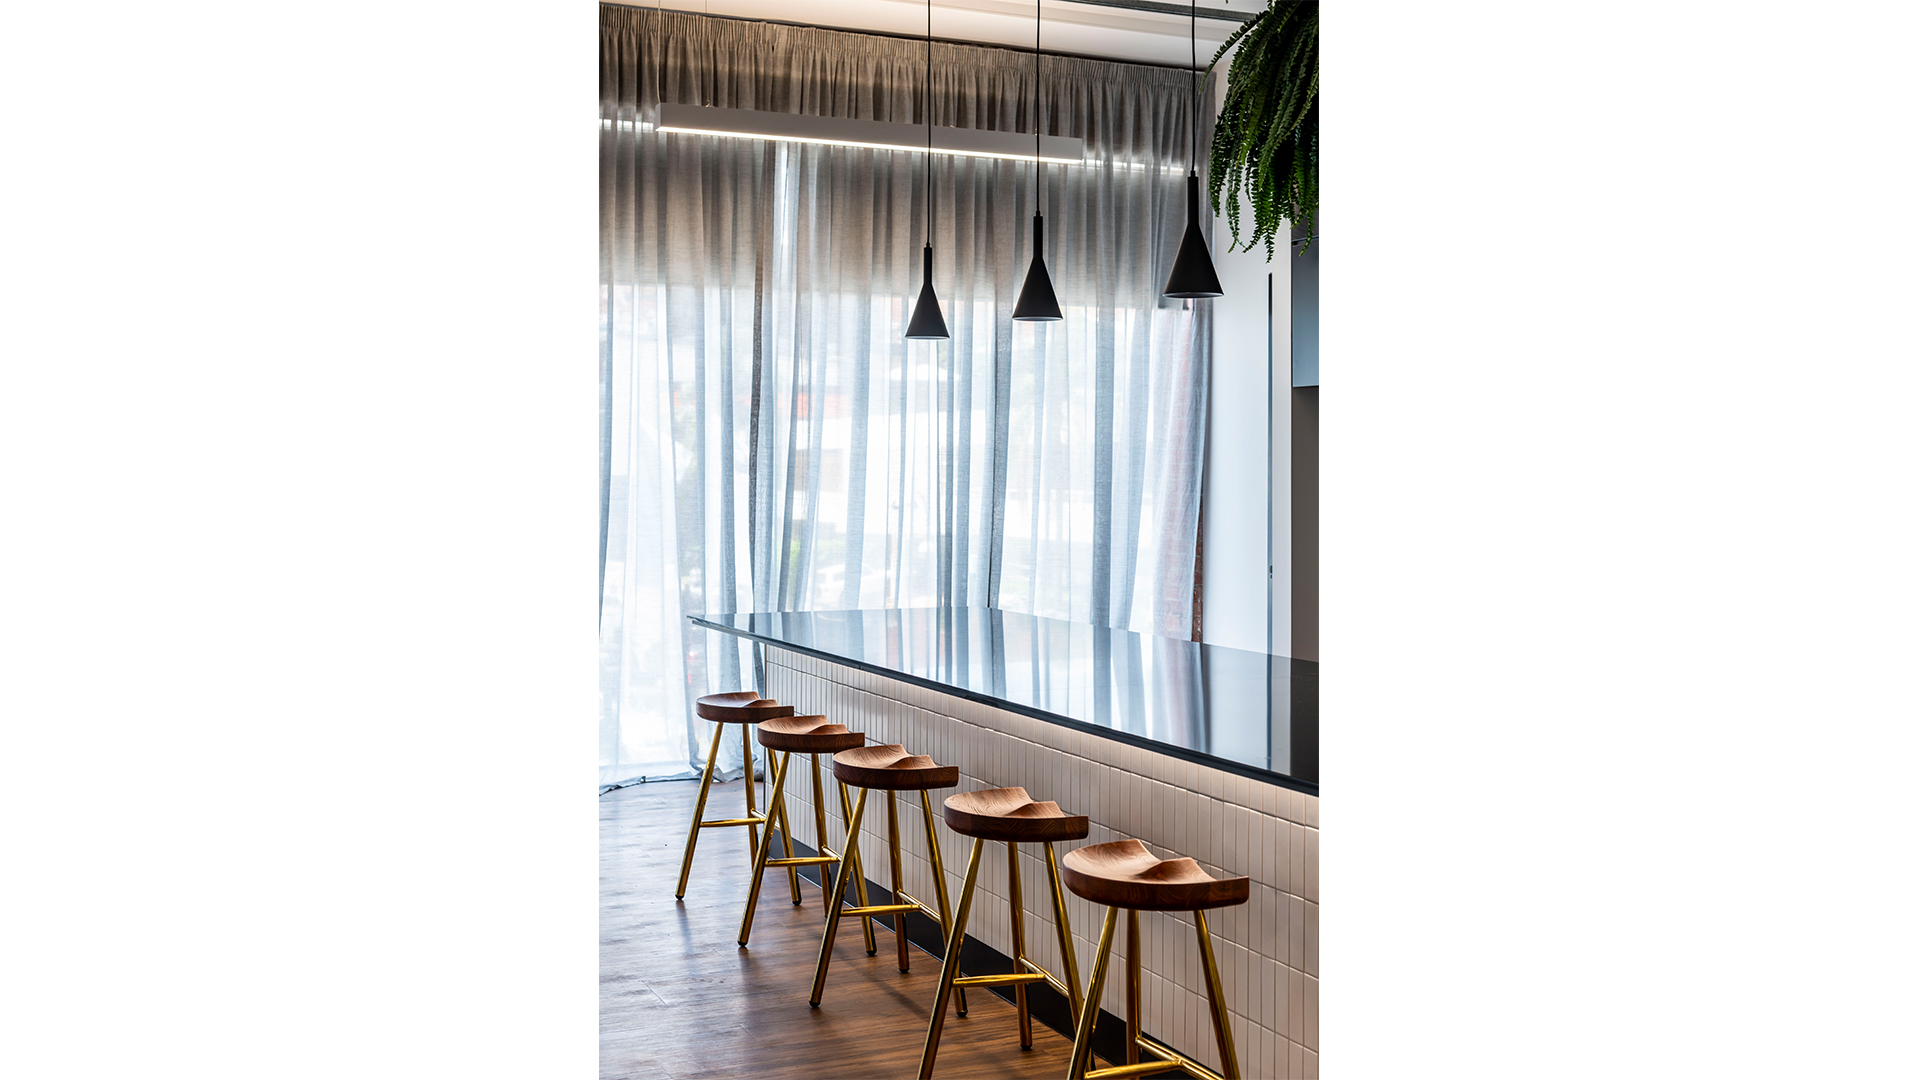 Porter Davis Showroom stools